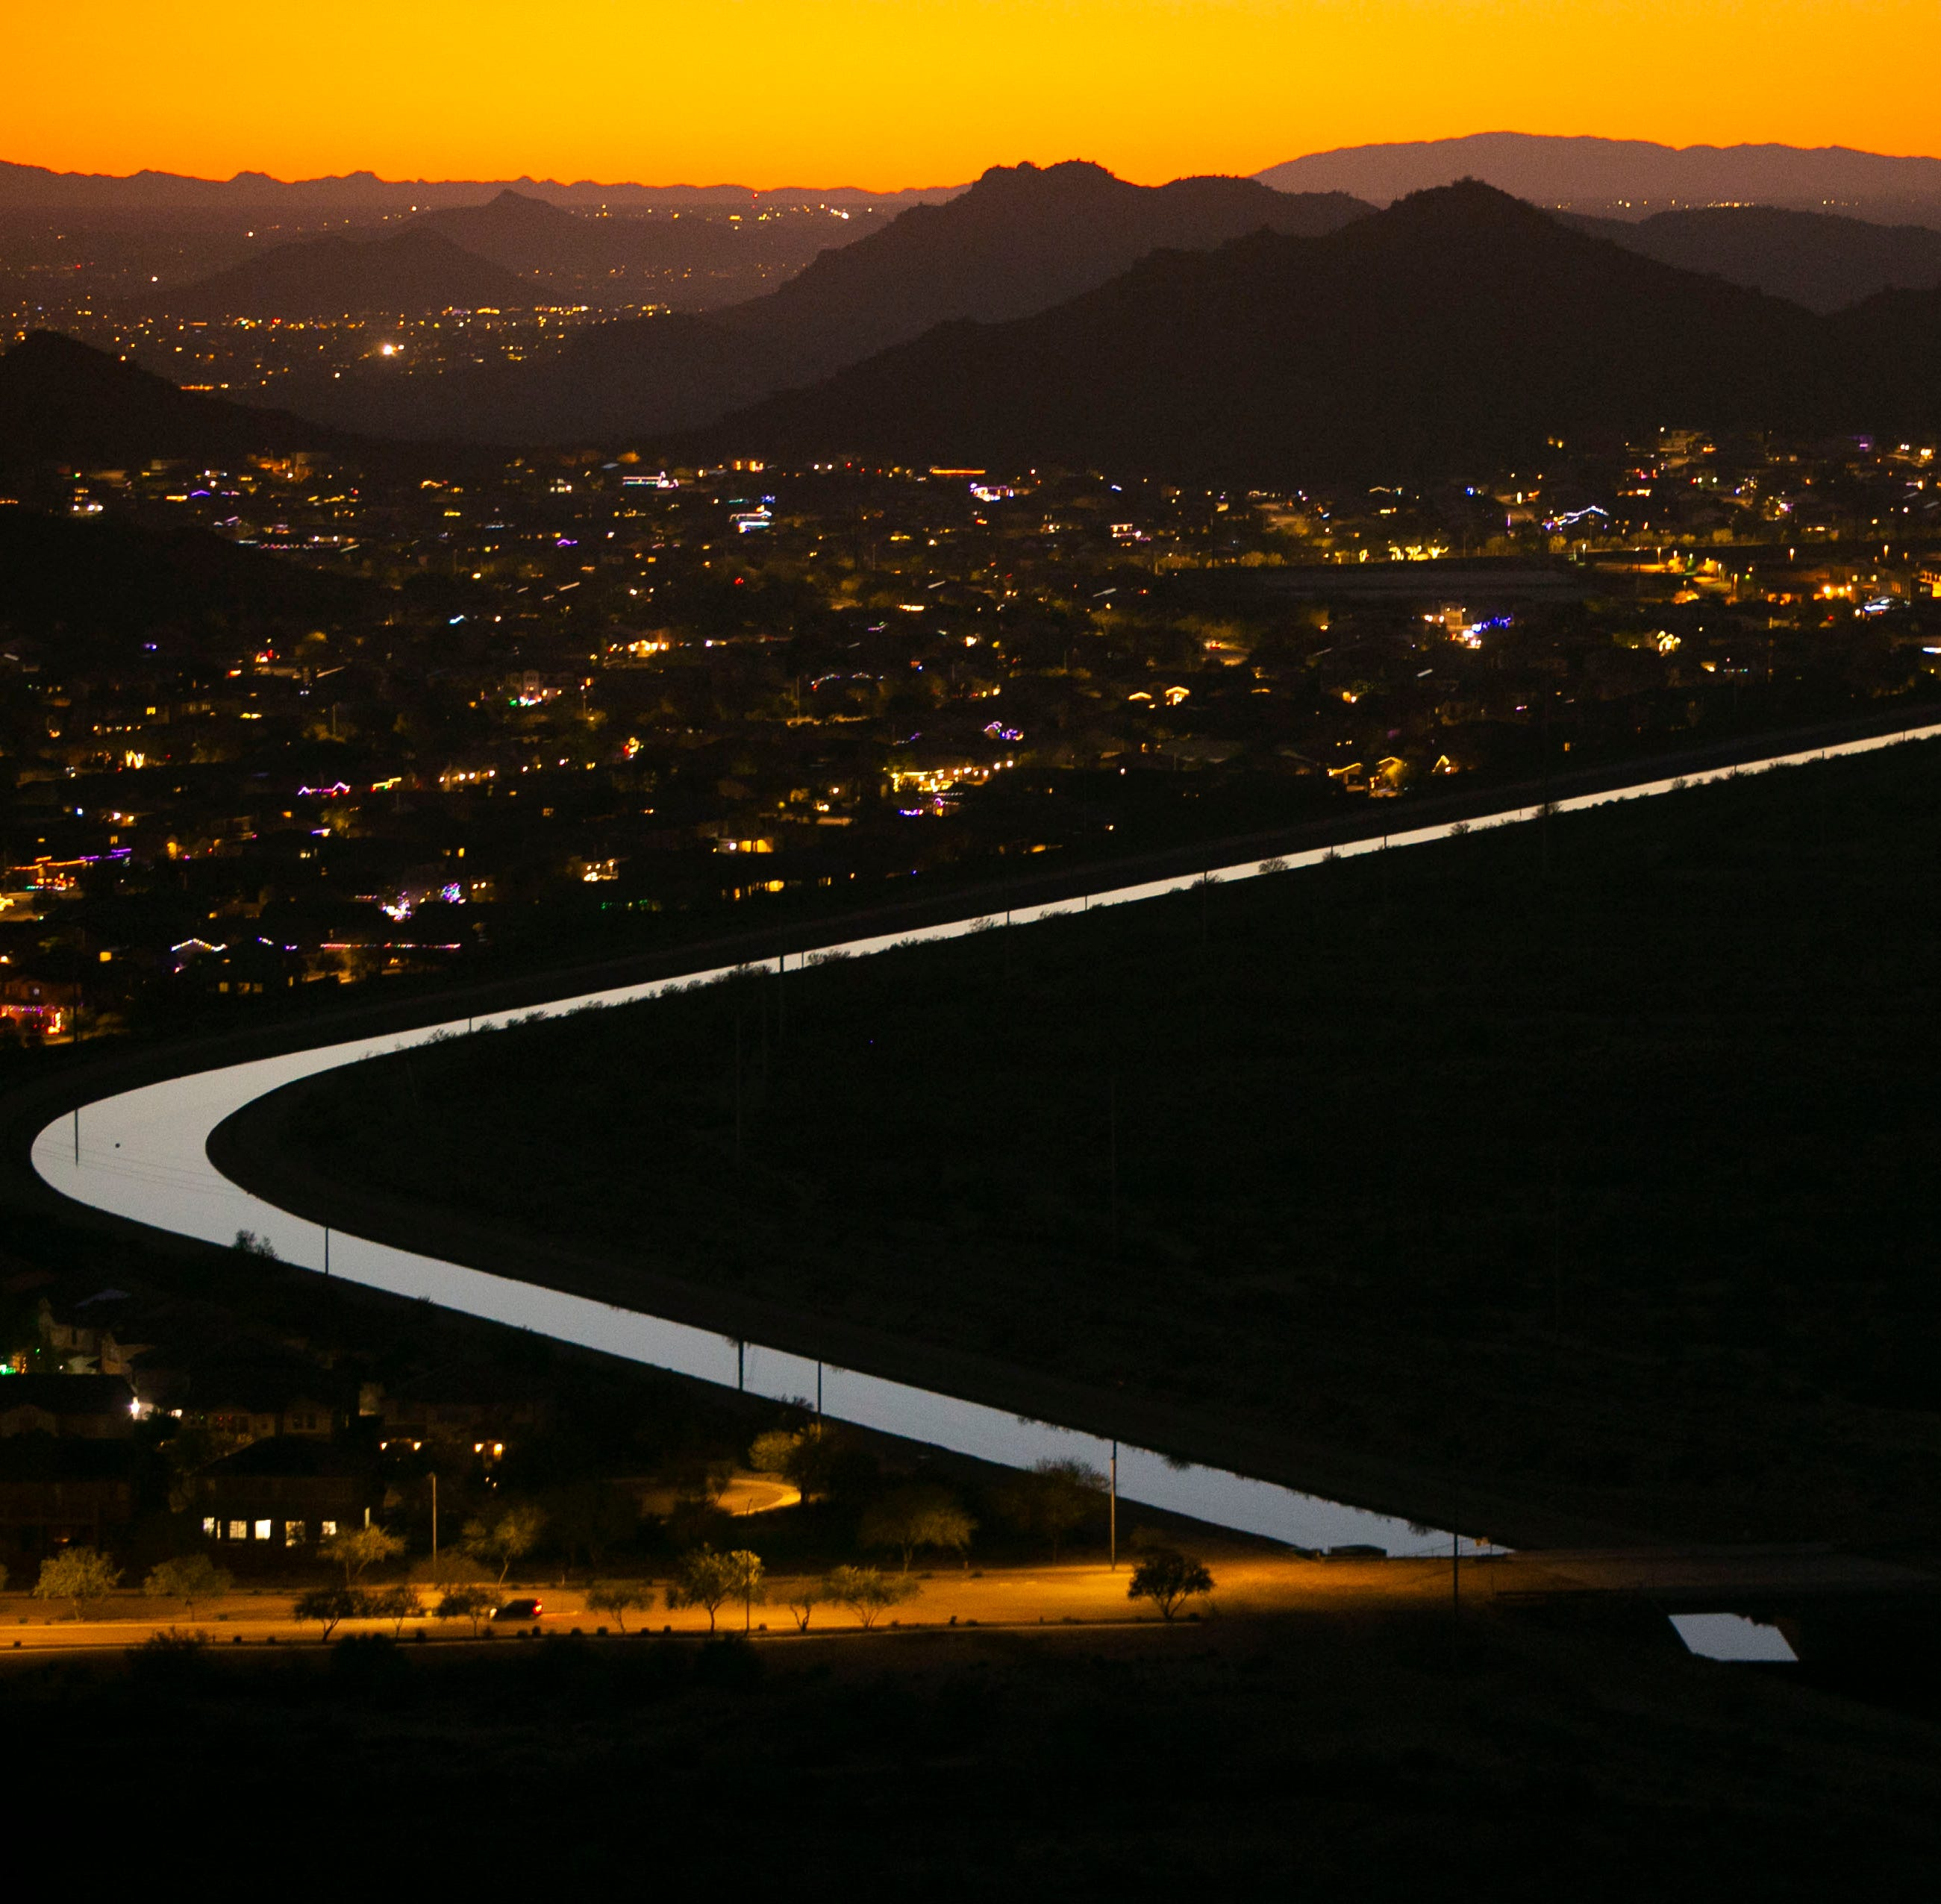 With Jan. 31 deadline looming, water legislation takes shape in Arizona